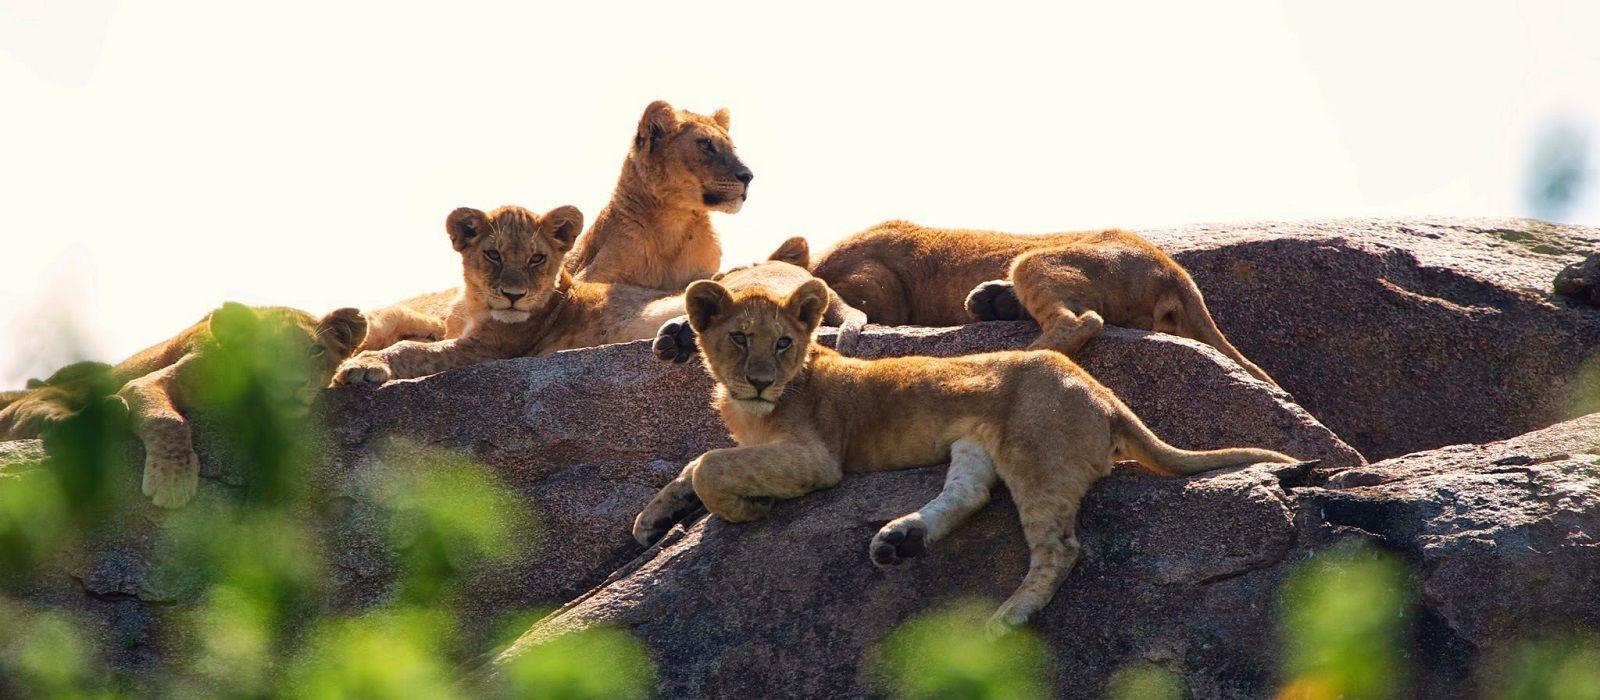 Safari Höhepunkte: Tansania, Simbabwe und Botswana Urlaub 4